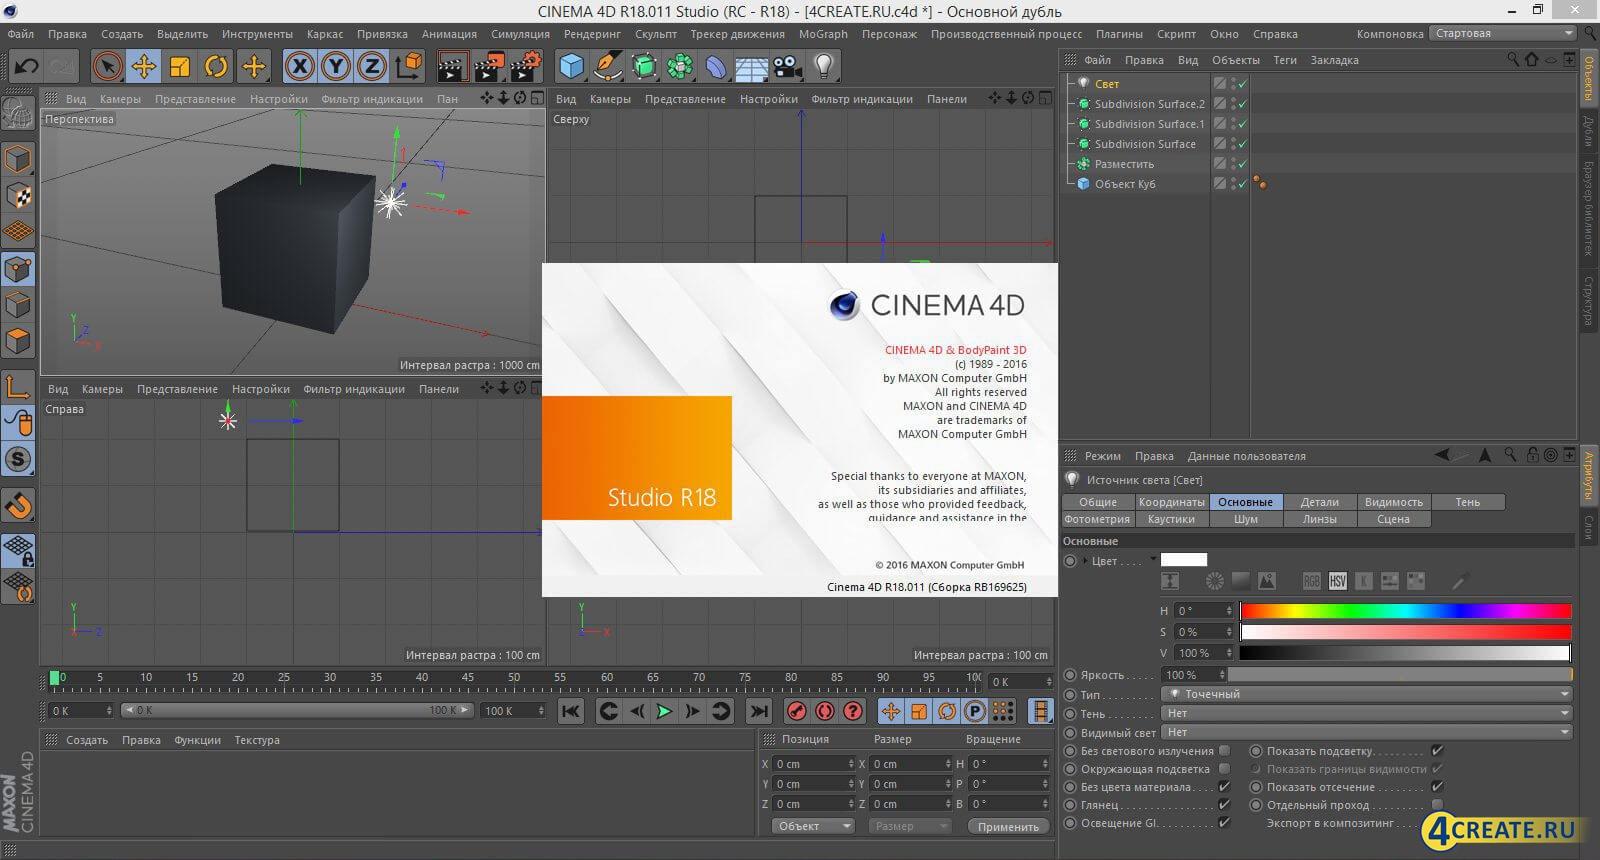 Cinema 4D R18 (Скриншот 1)